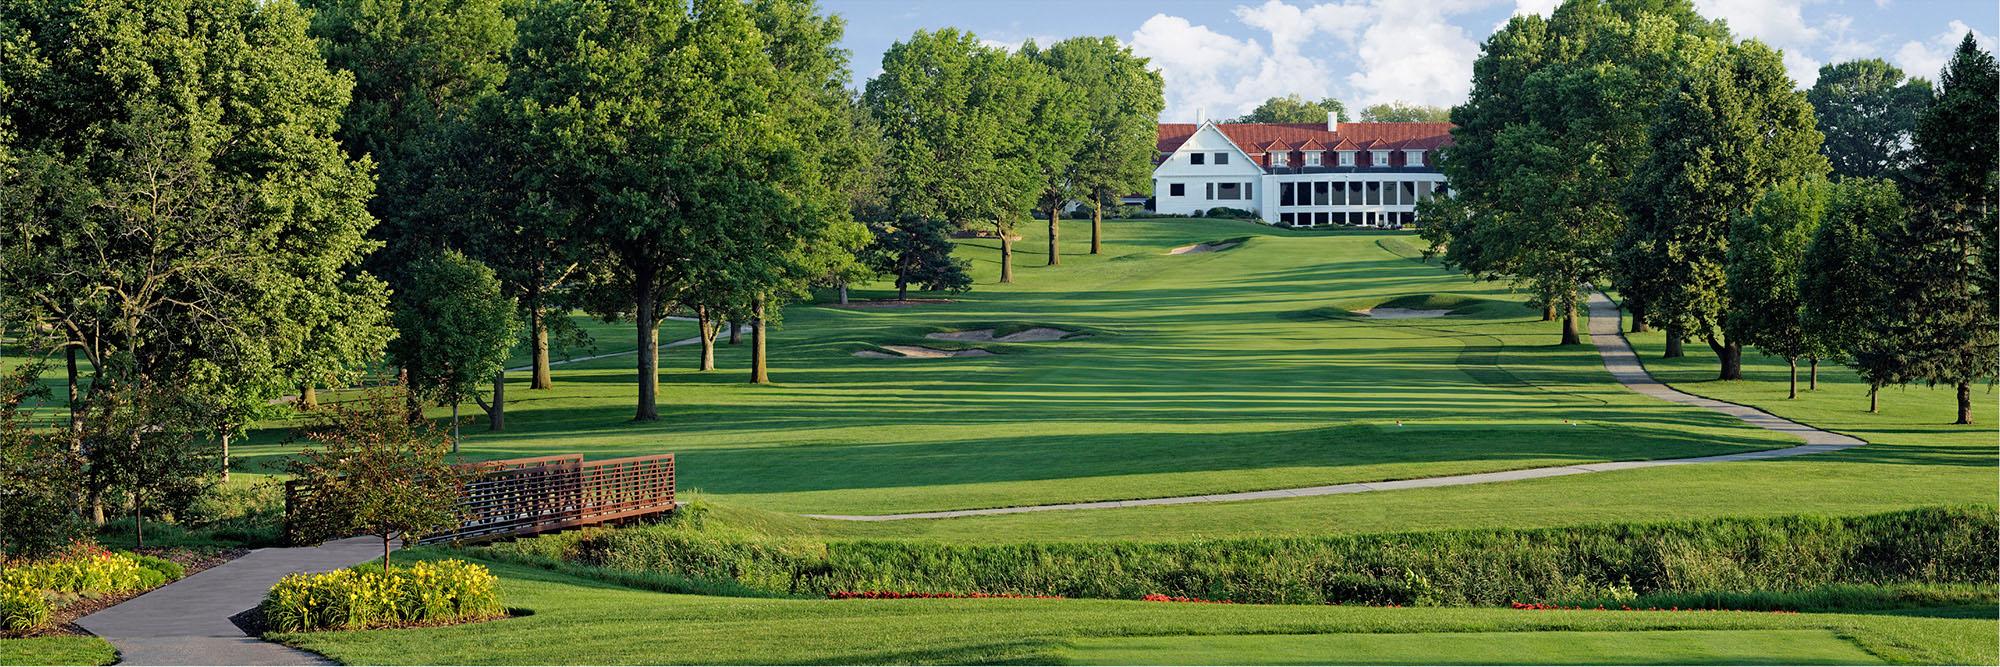 Golf Course Image - Happy Hollow Golf Club No. 9